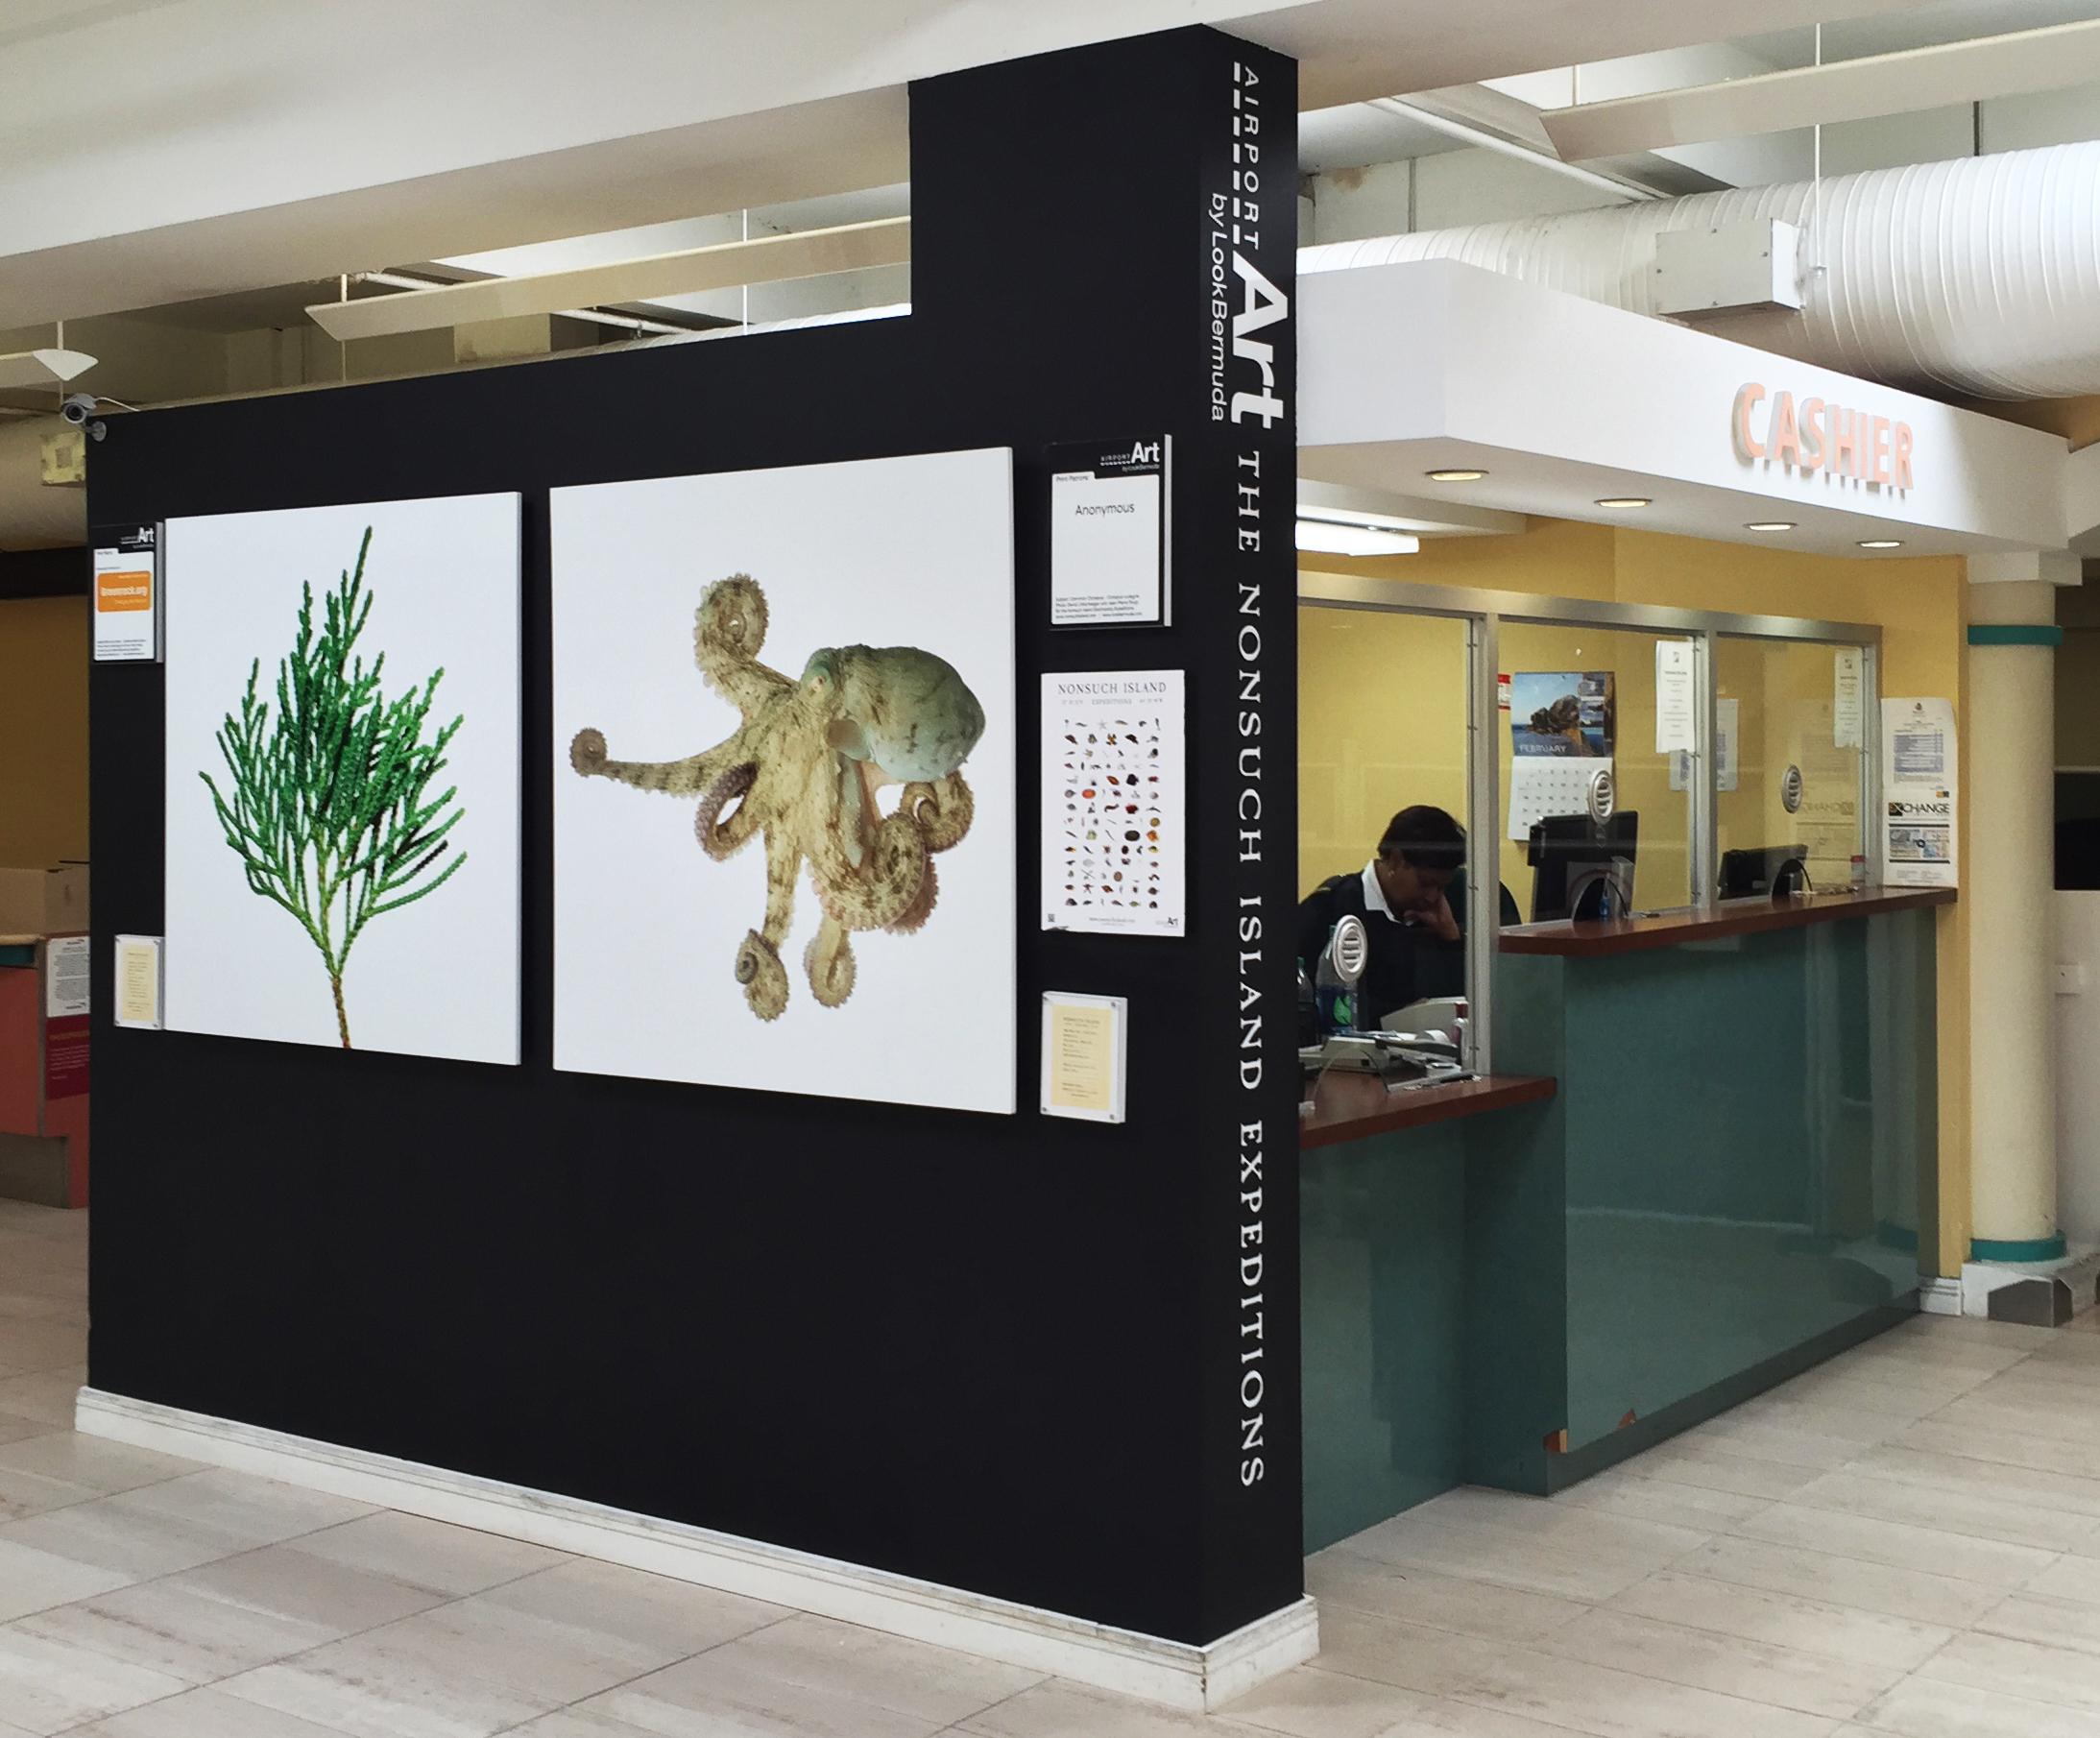 LookBermuda AirportArt Project